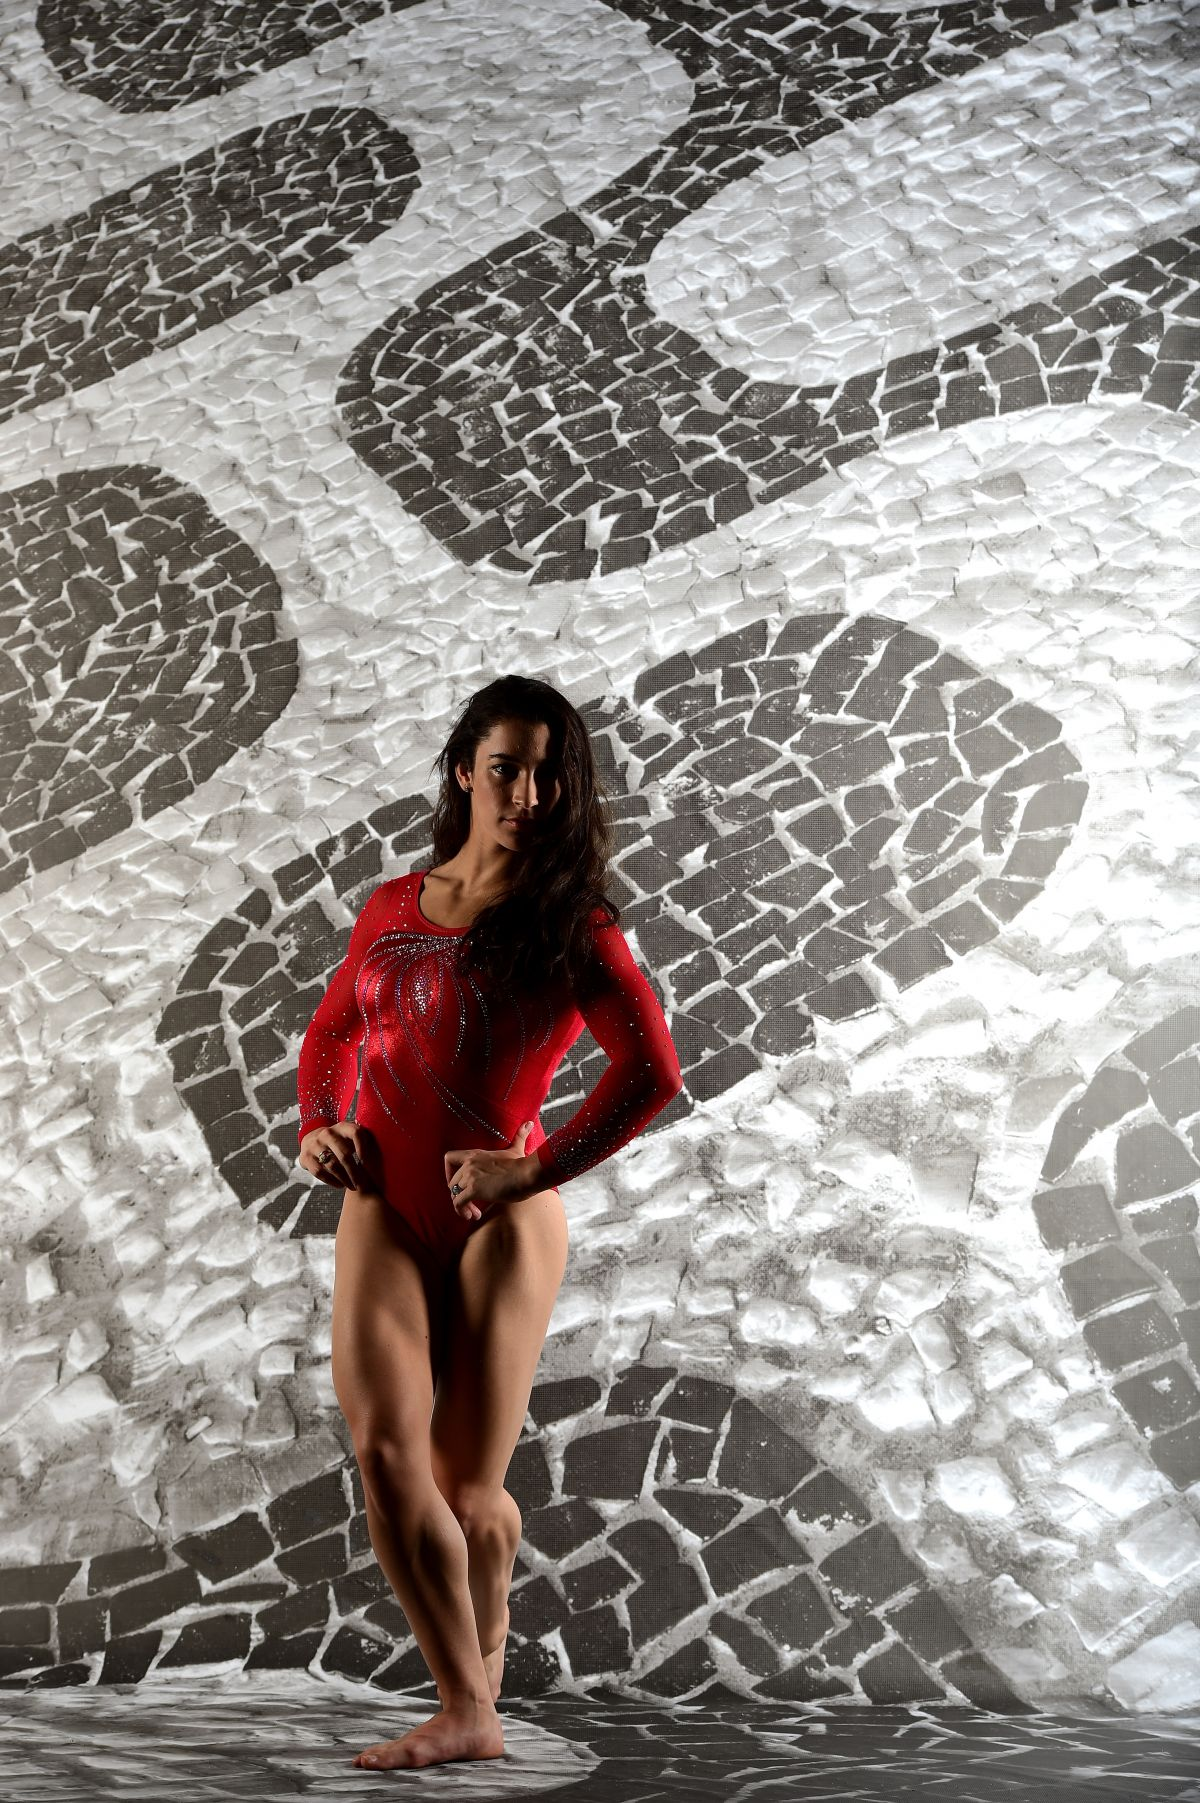 ALY RAISMAN - USOC Portraits for Rio2016 - HawtCelebs